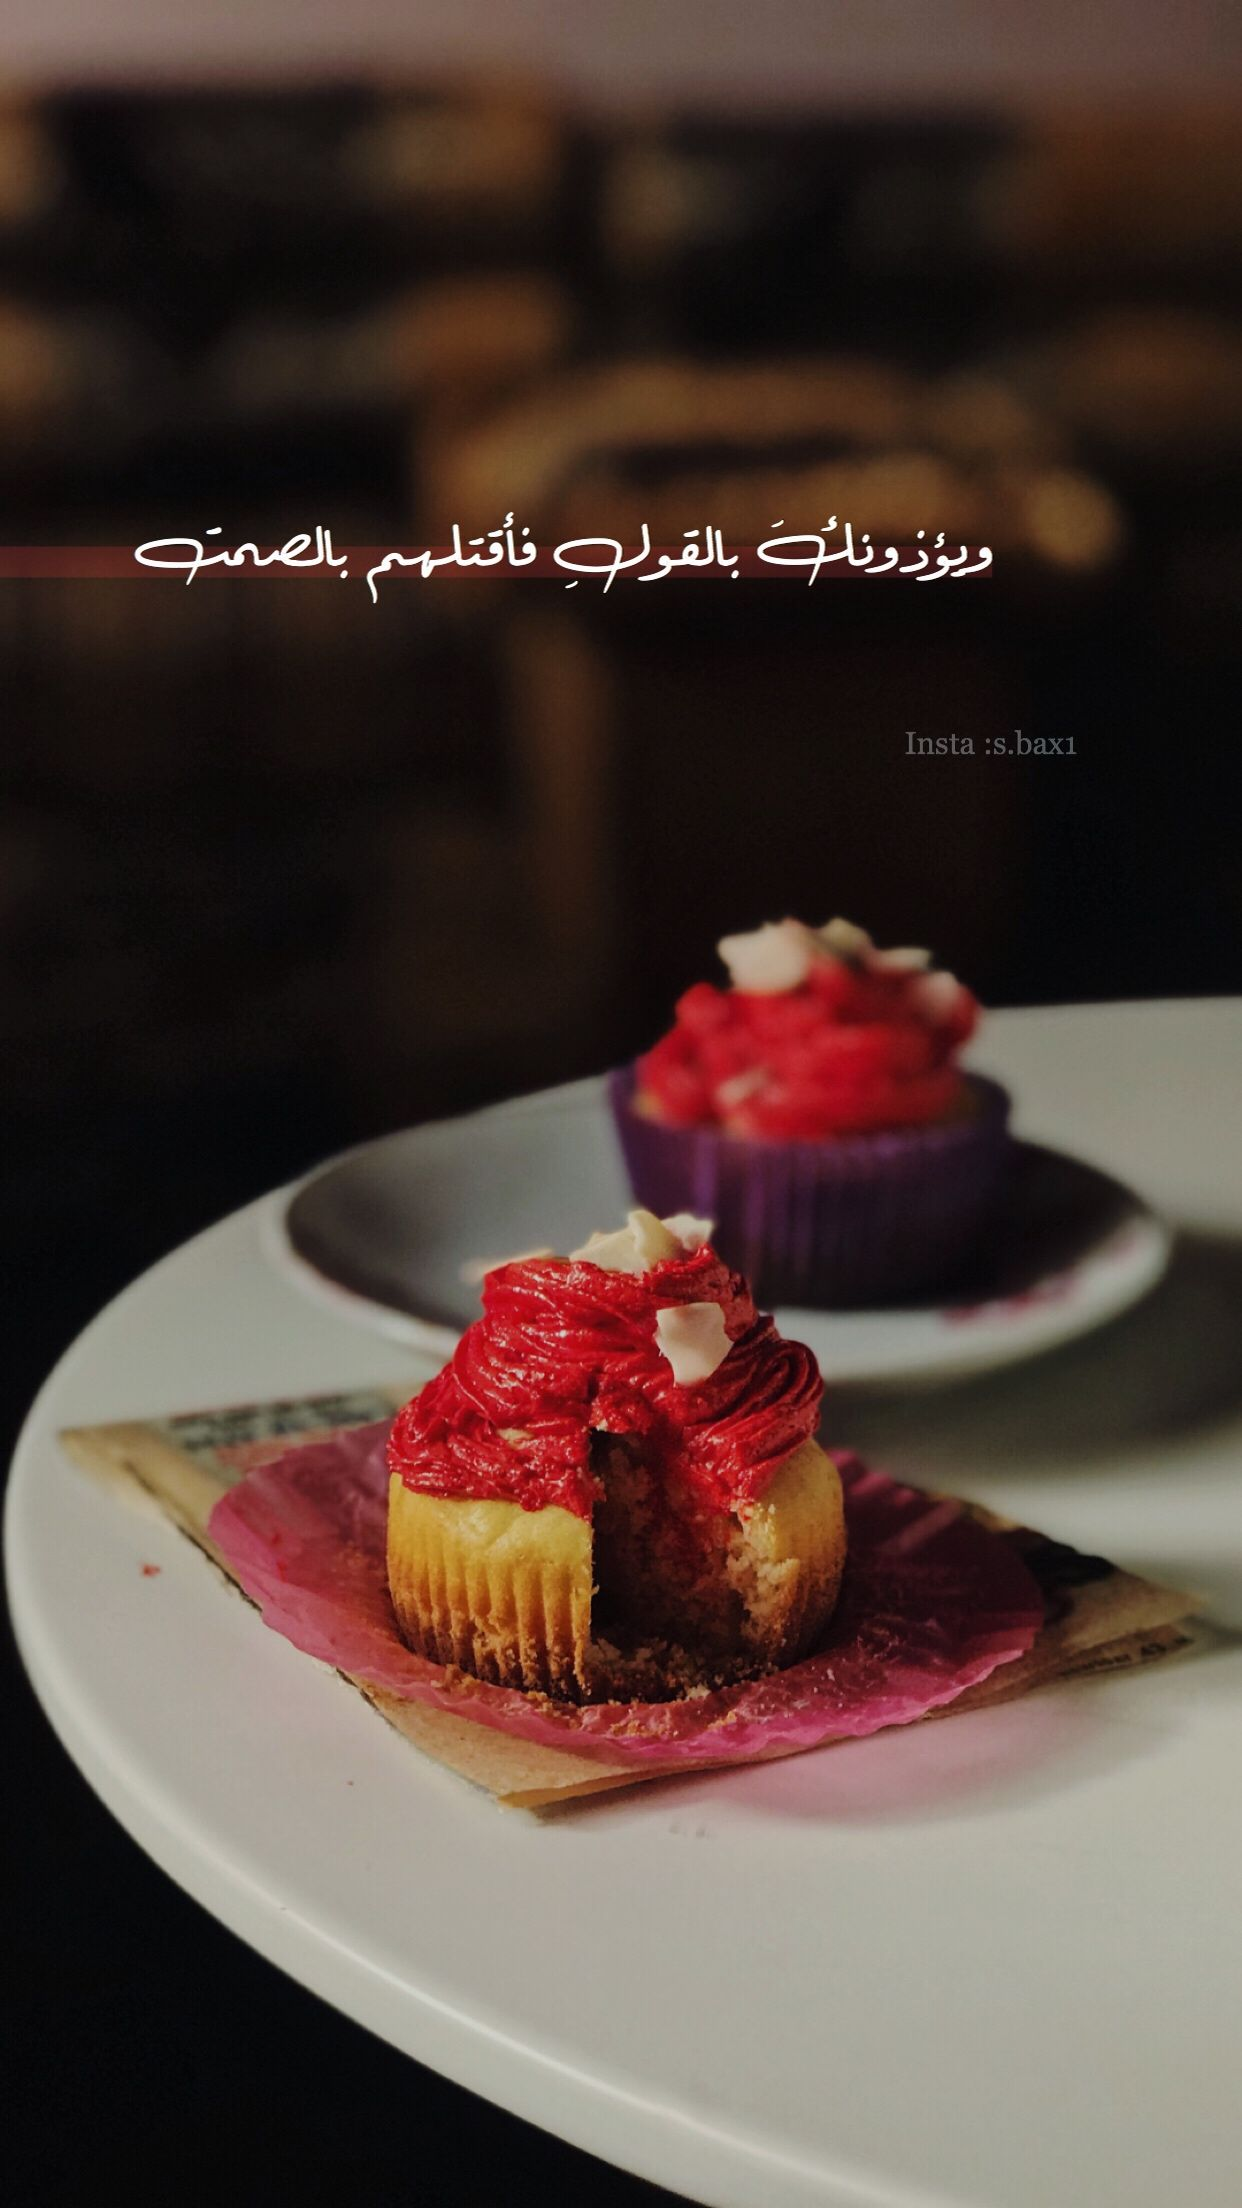 كيك صور كب كيك تصوير احتراف قهوه شاي فن ابداع روقان سنابيات انستقرام عبارات صور اكل Desserts Mini Cheesecake Cheesecake